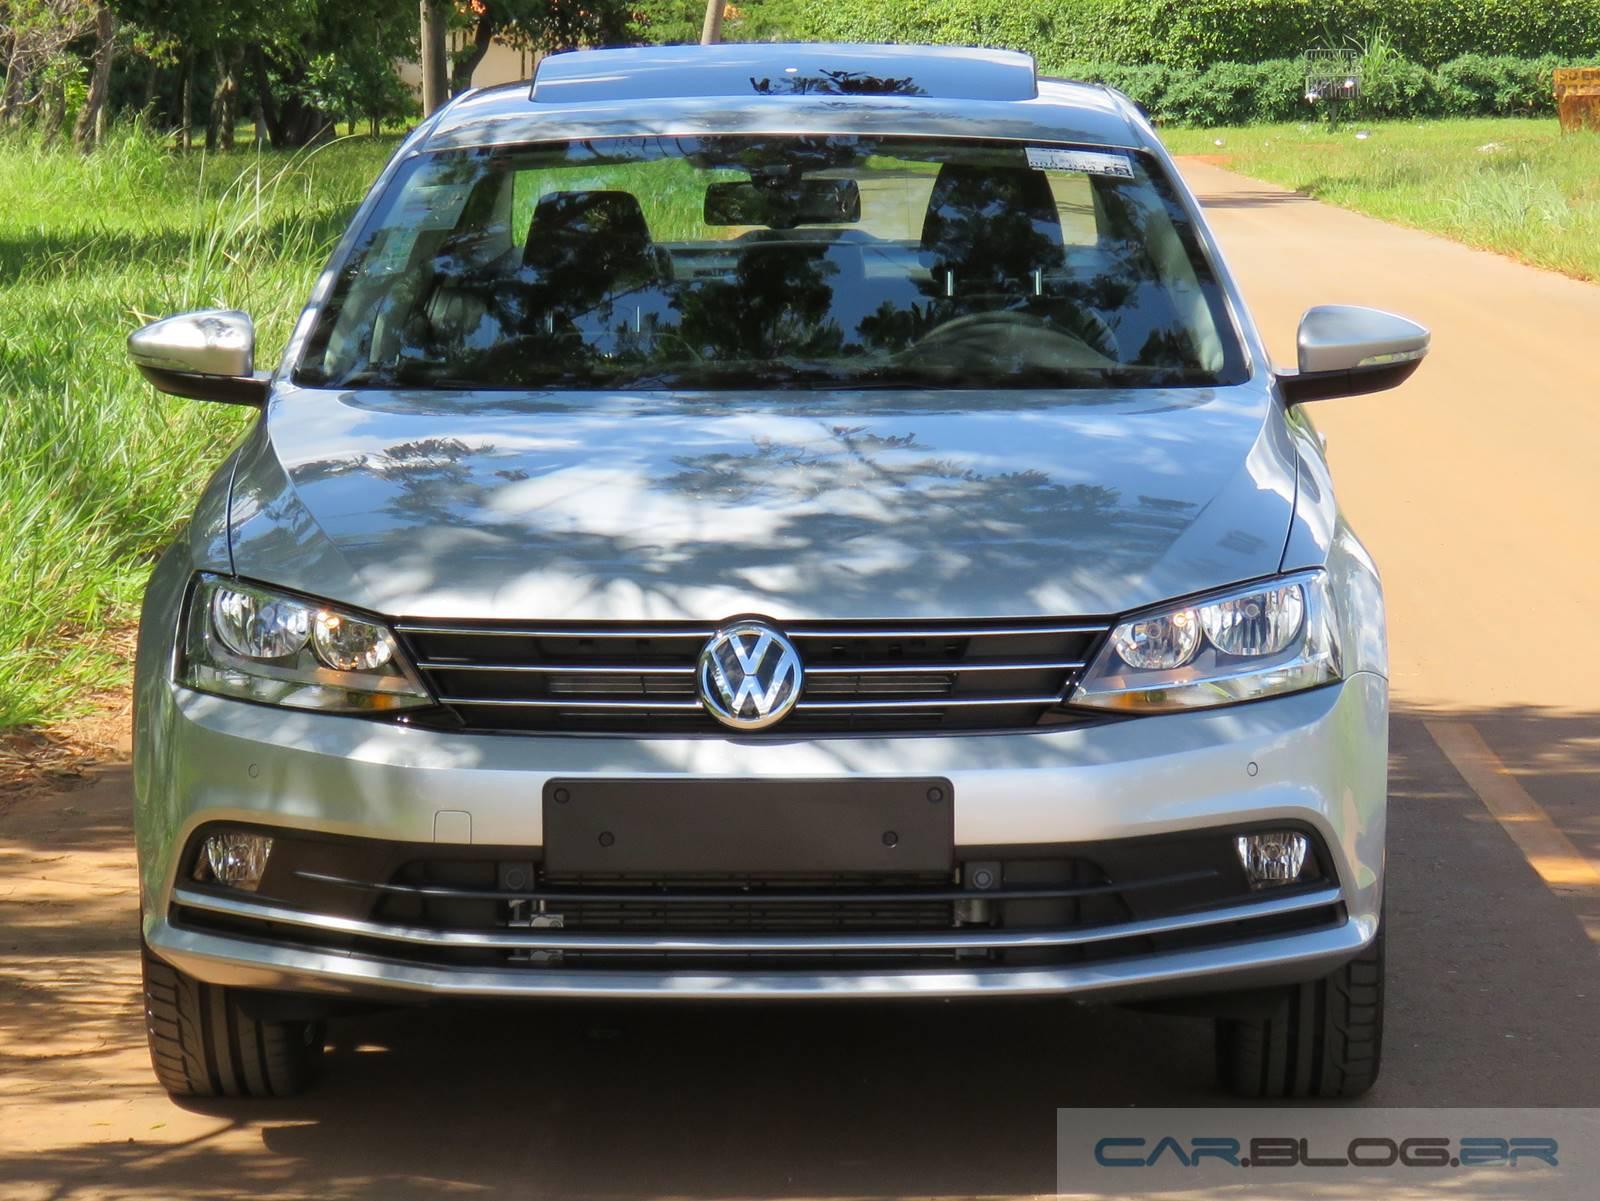 VW Jetta 1.4 TSI Comfortline